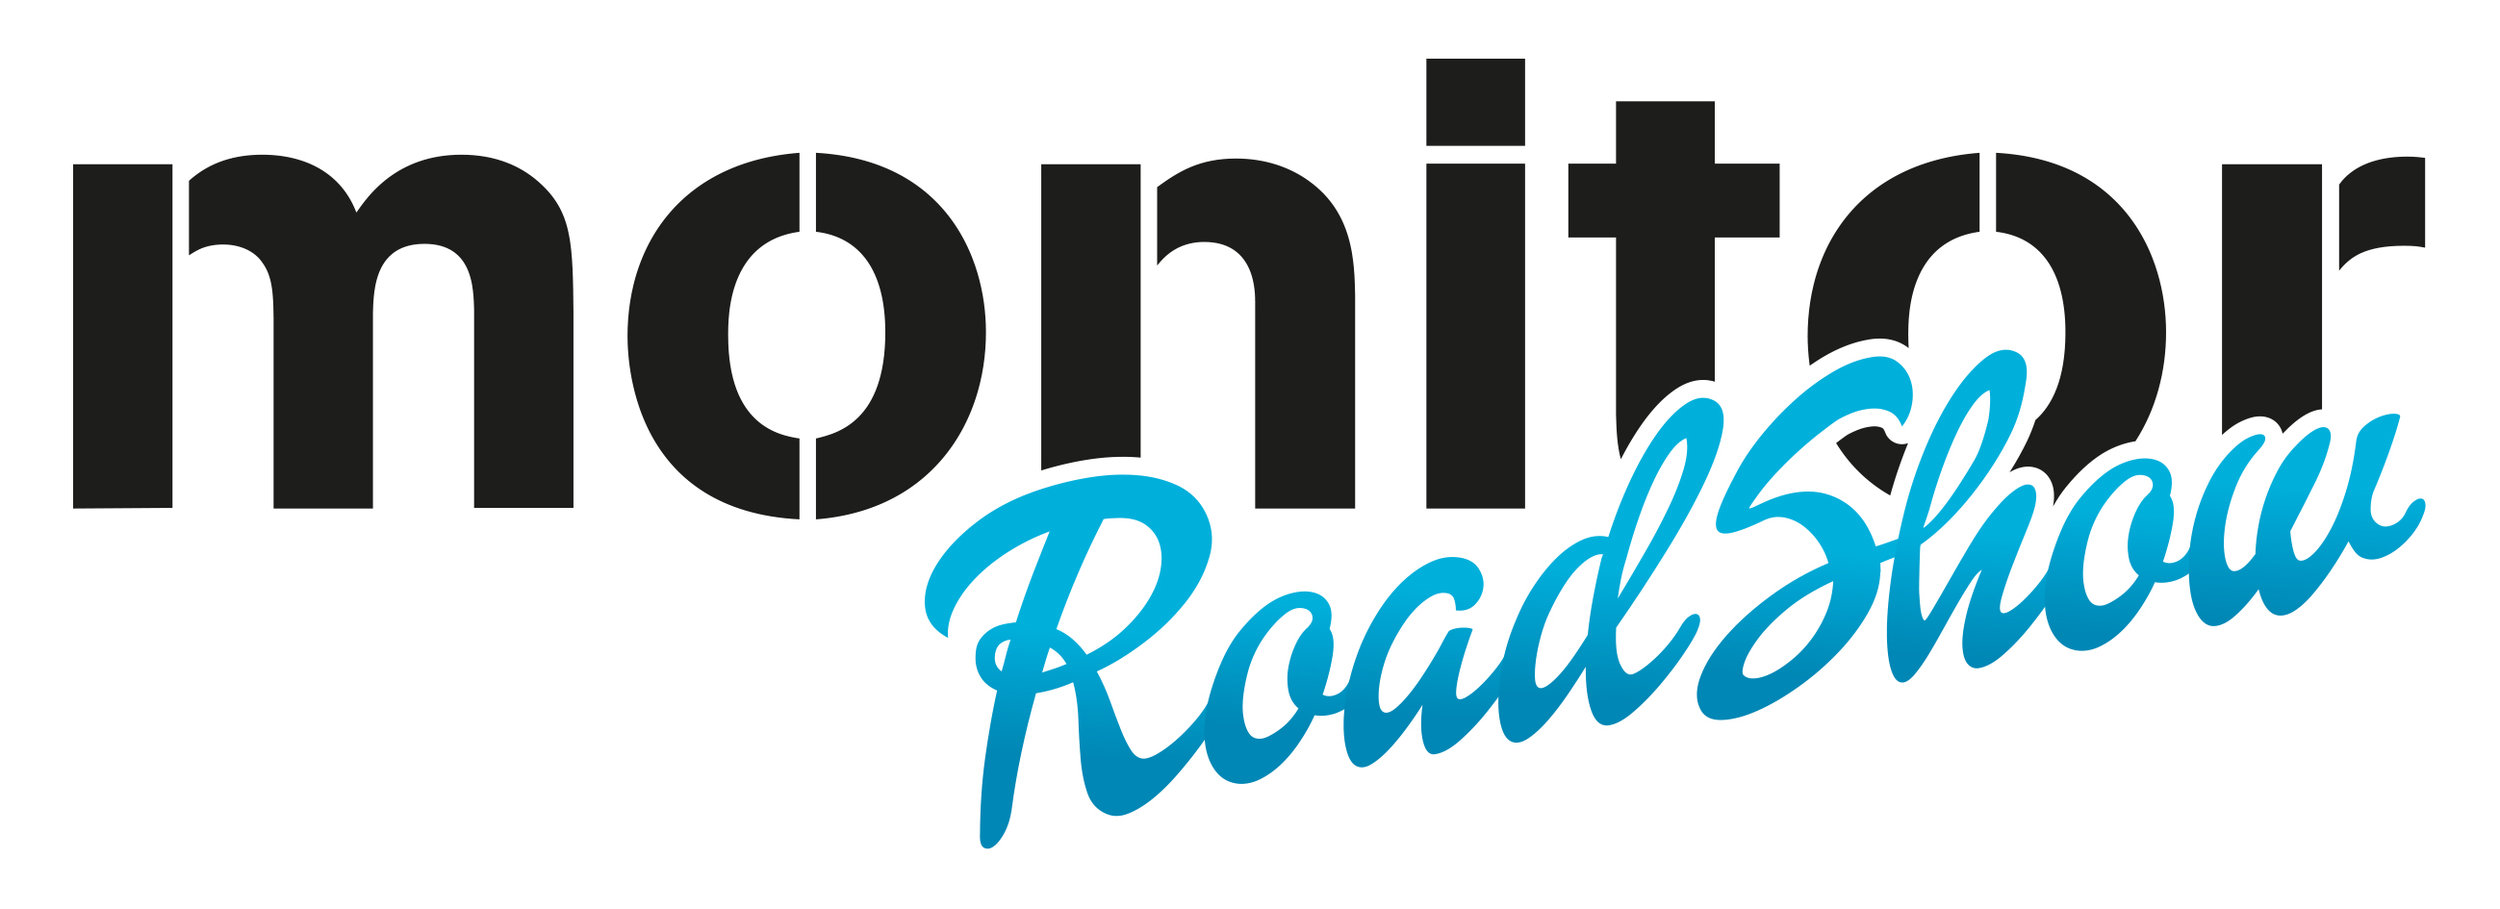 monitor_roadshow_logo_cutout.jpg